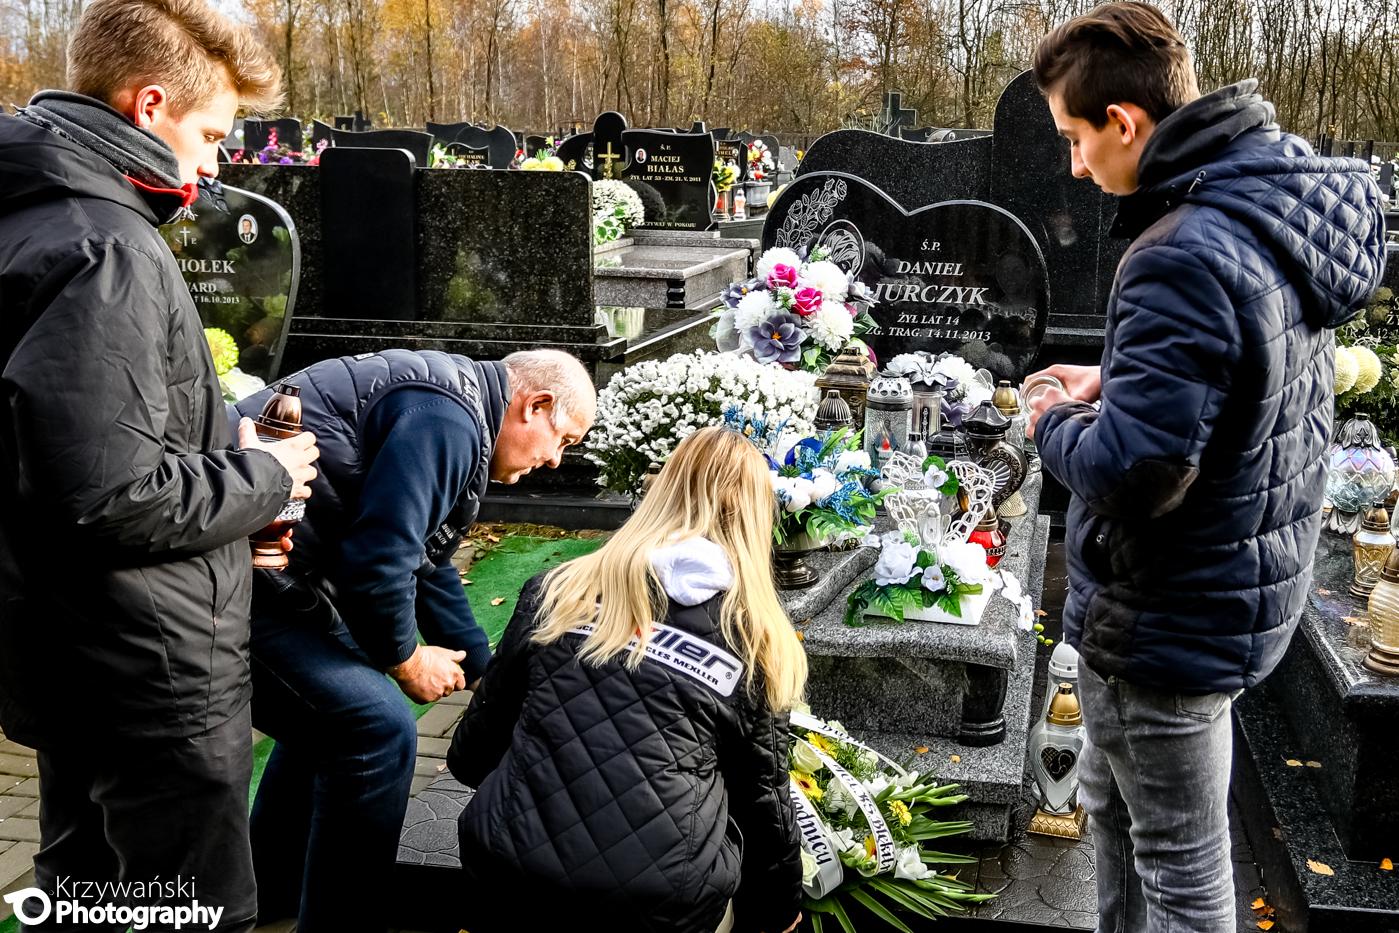 https://magazynrowerowy.pl/logmein/wp-content/uploads/2017/11/Orlen-PP-CX-VIII-seria_Kozieglowy_0008_.jpg